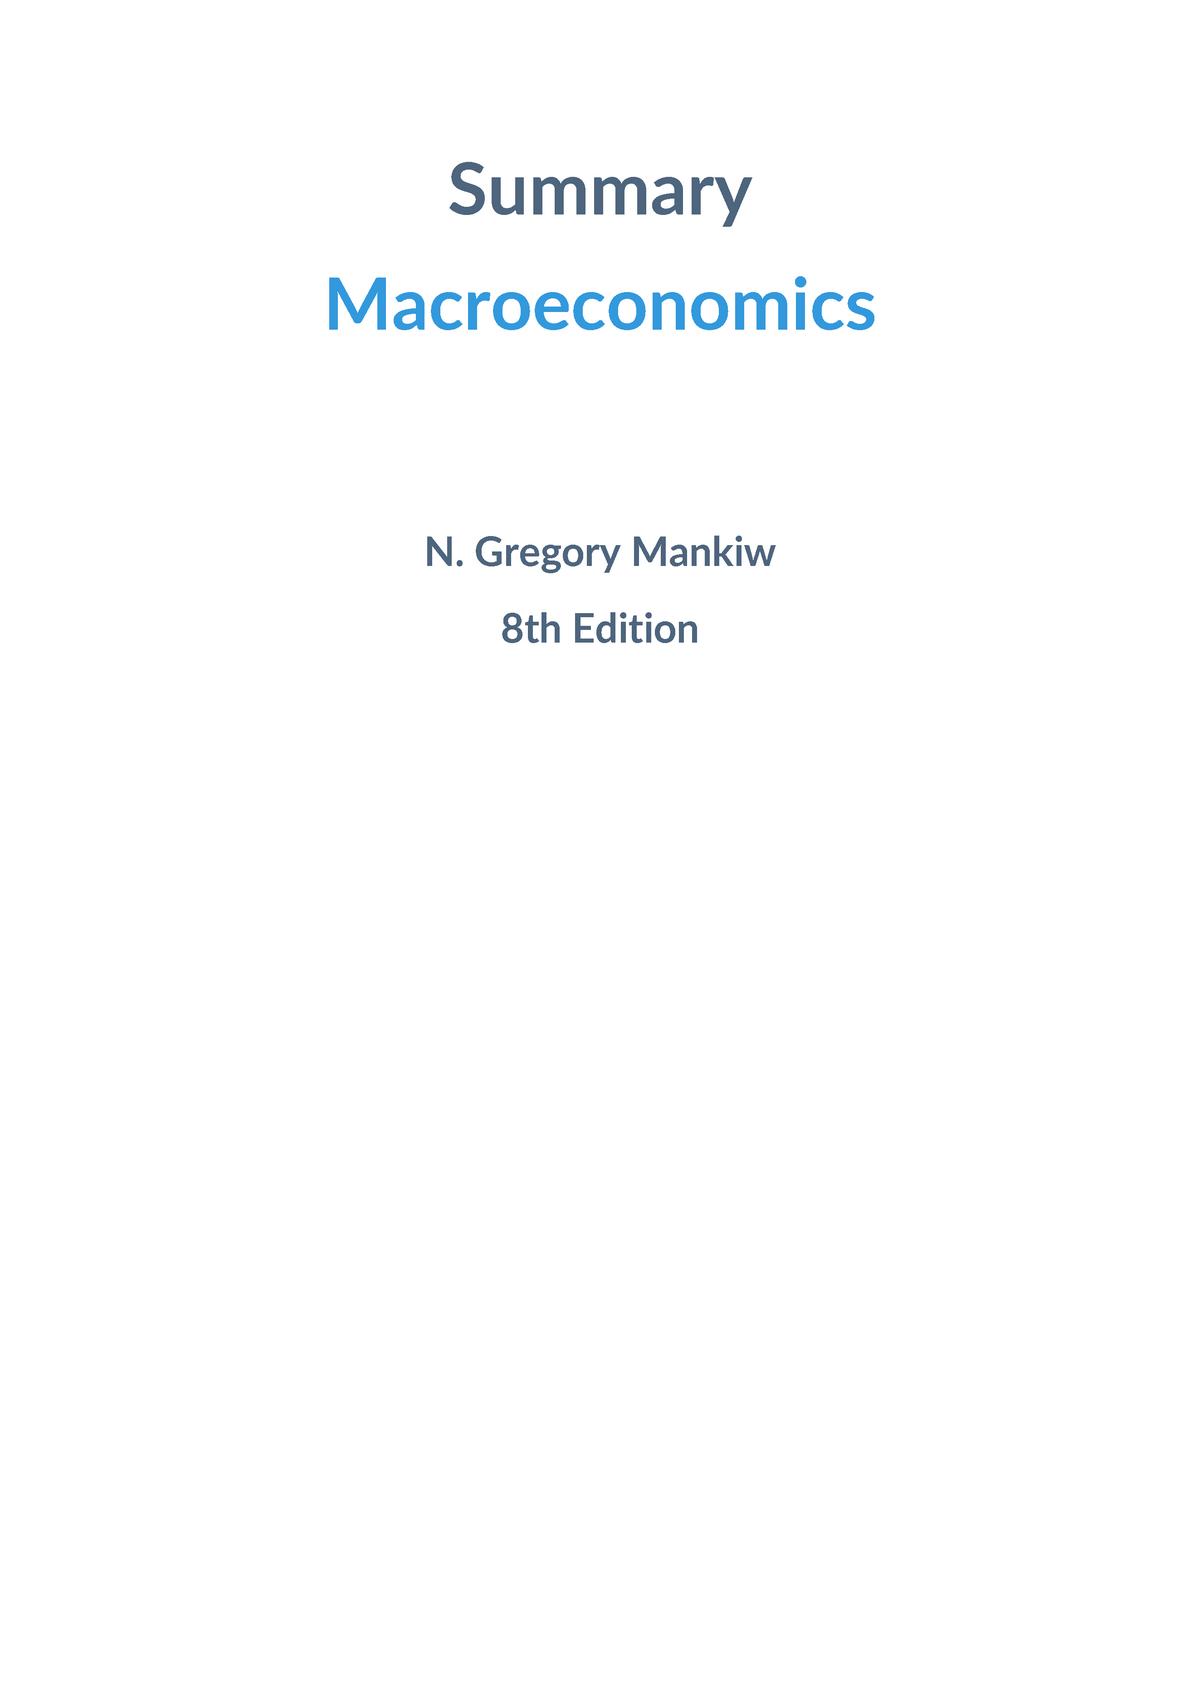 Summary Macroeconomics - N  Gregory Mankiw - ECON1102 - UNSW